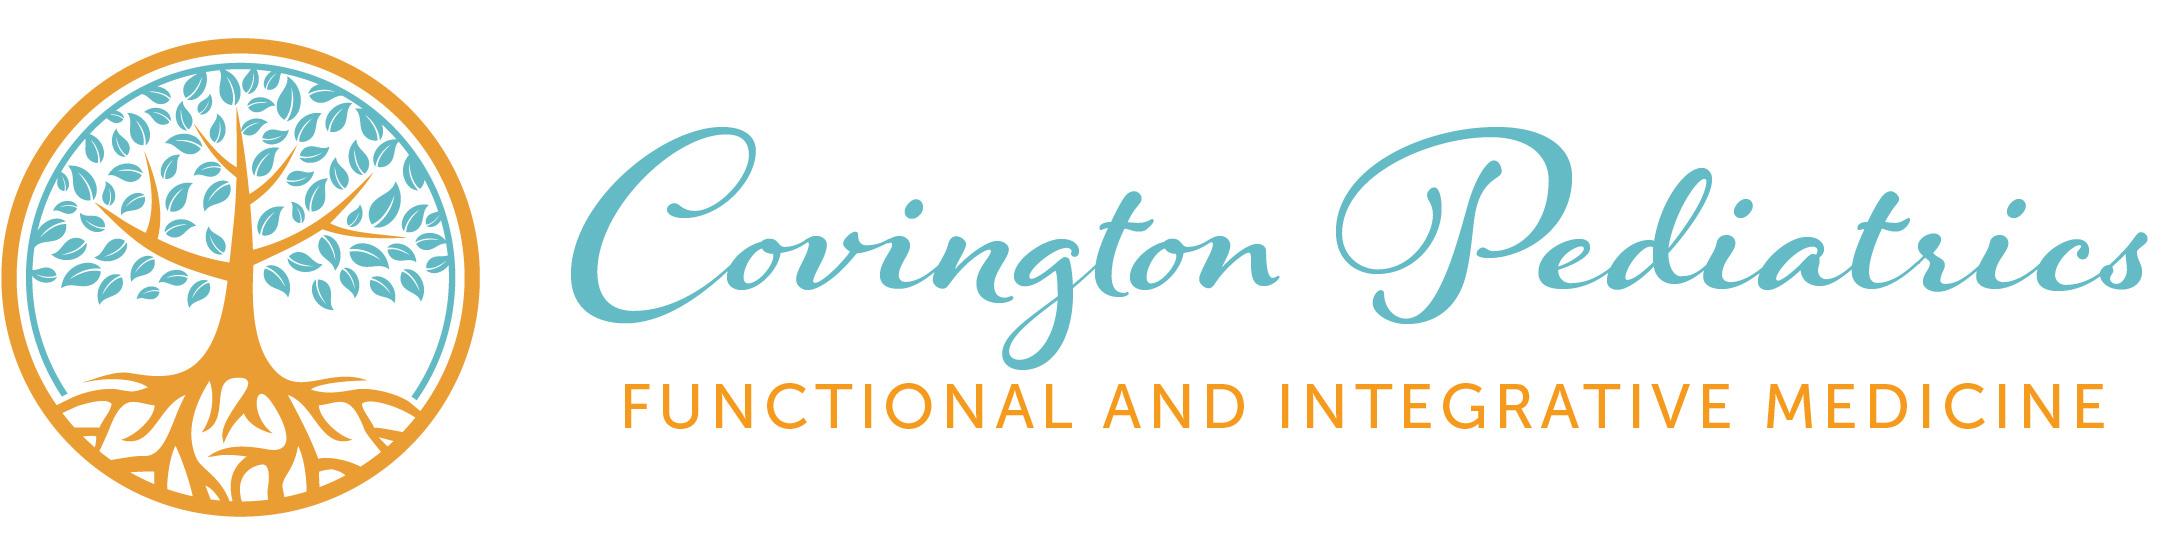 Covington Pediatrics